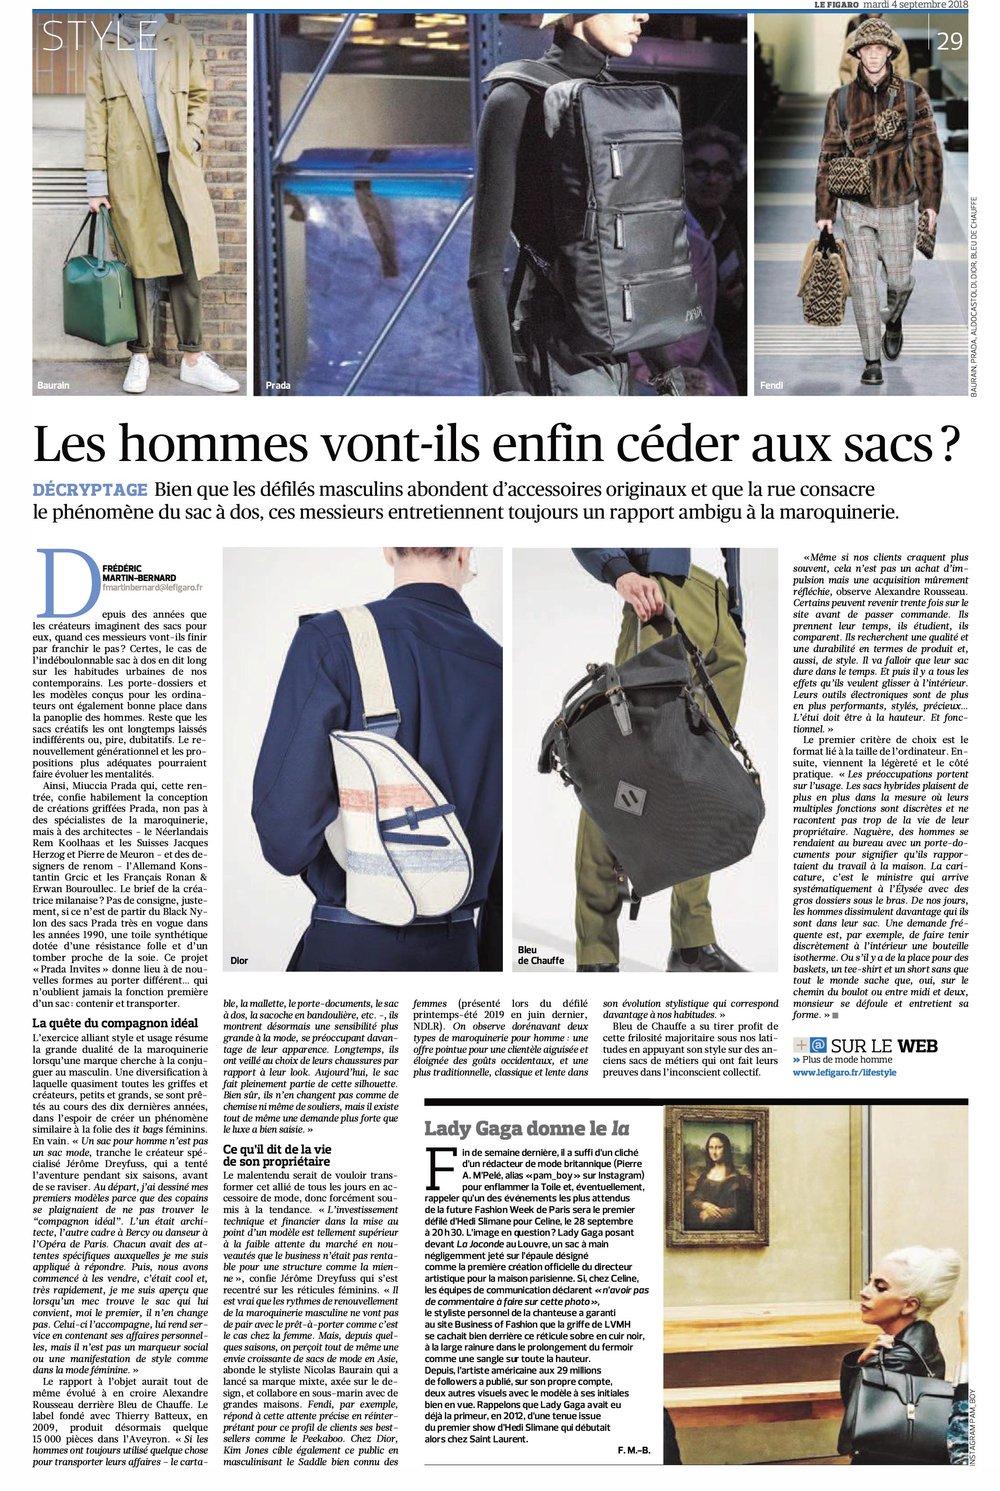 BAURAIN in Le Figaro September 2018